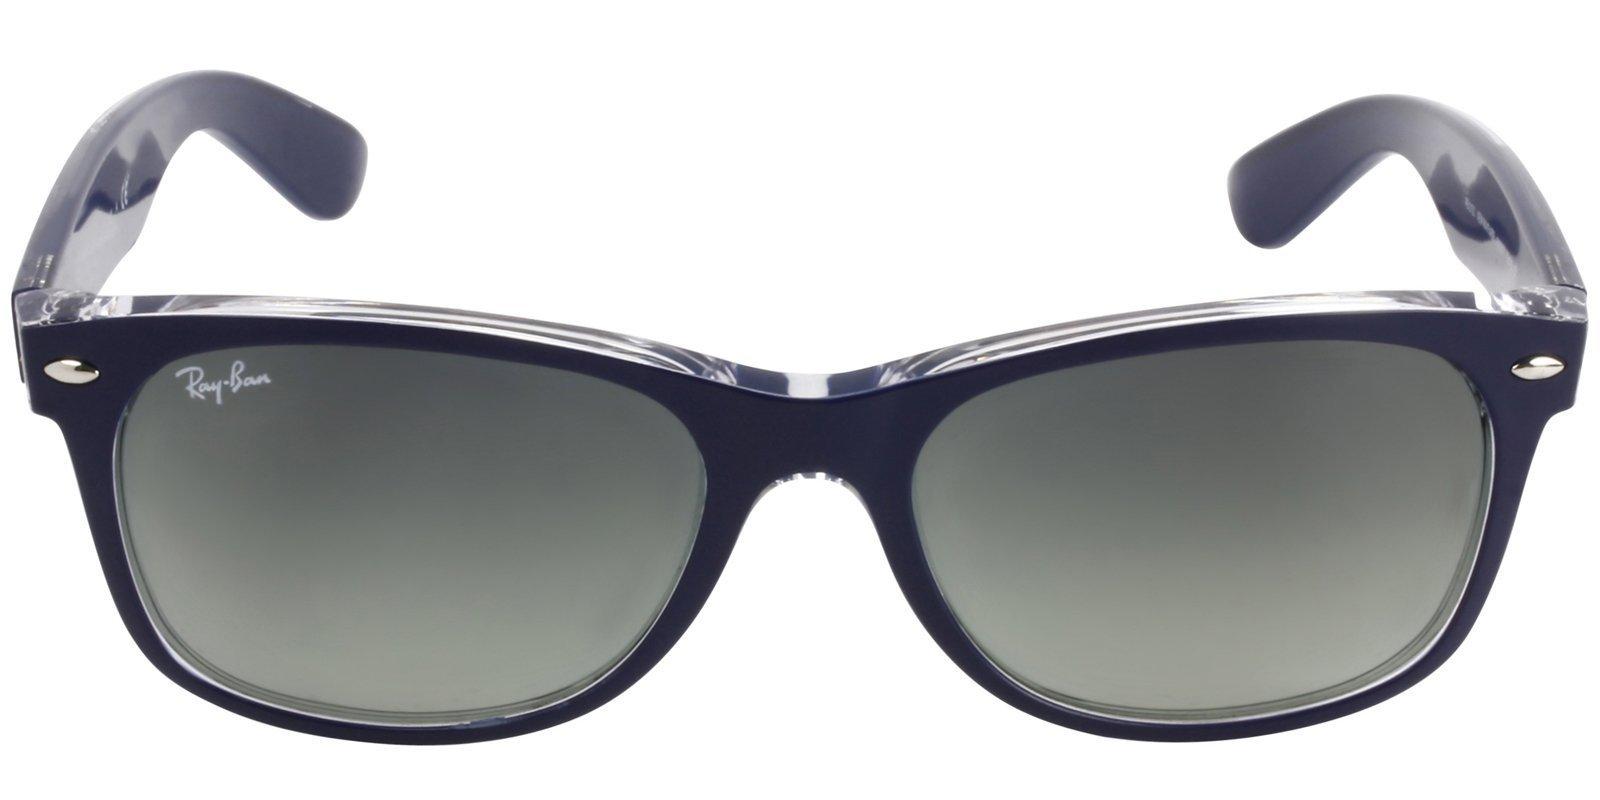 b8b884505a Ray Ban - New Wayfarer Blue - Gray sunglasses